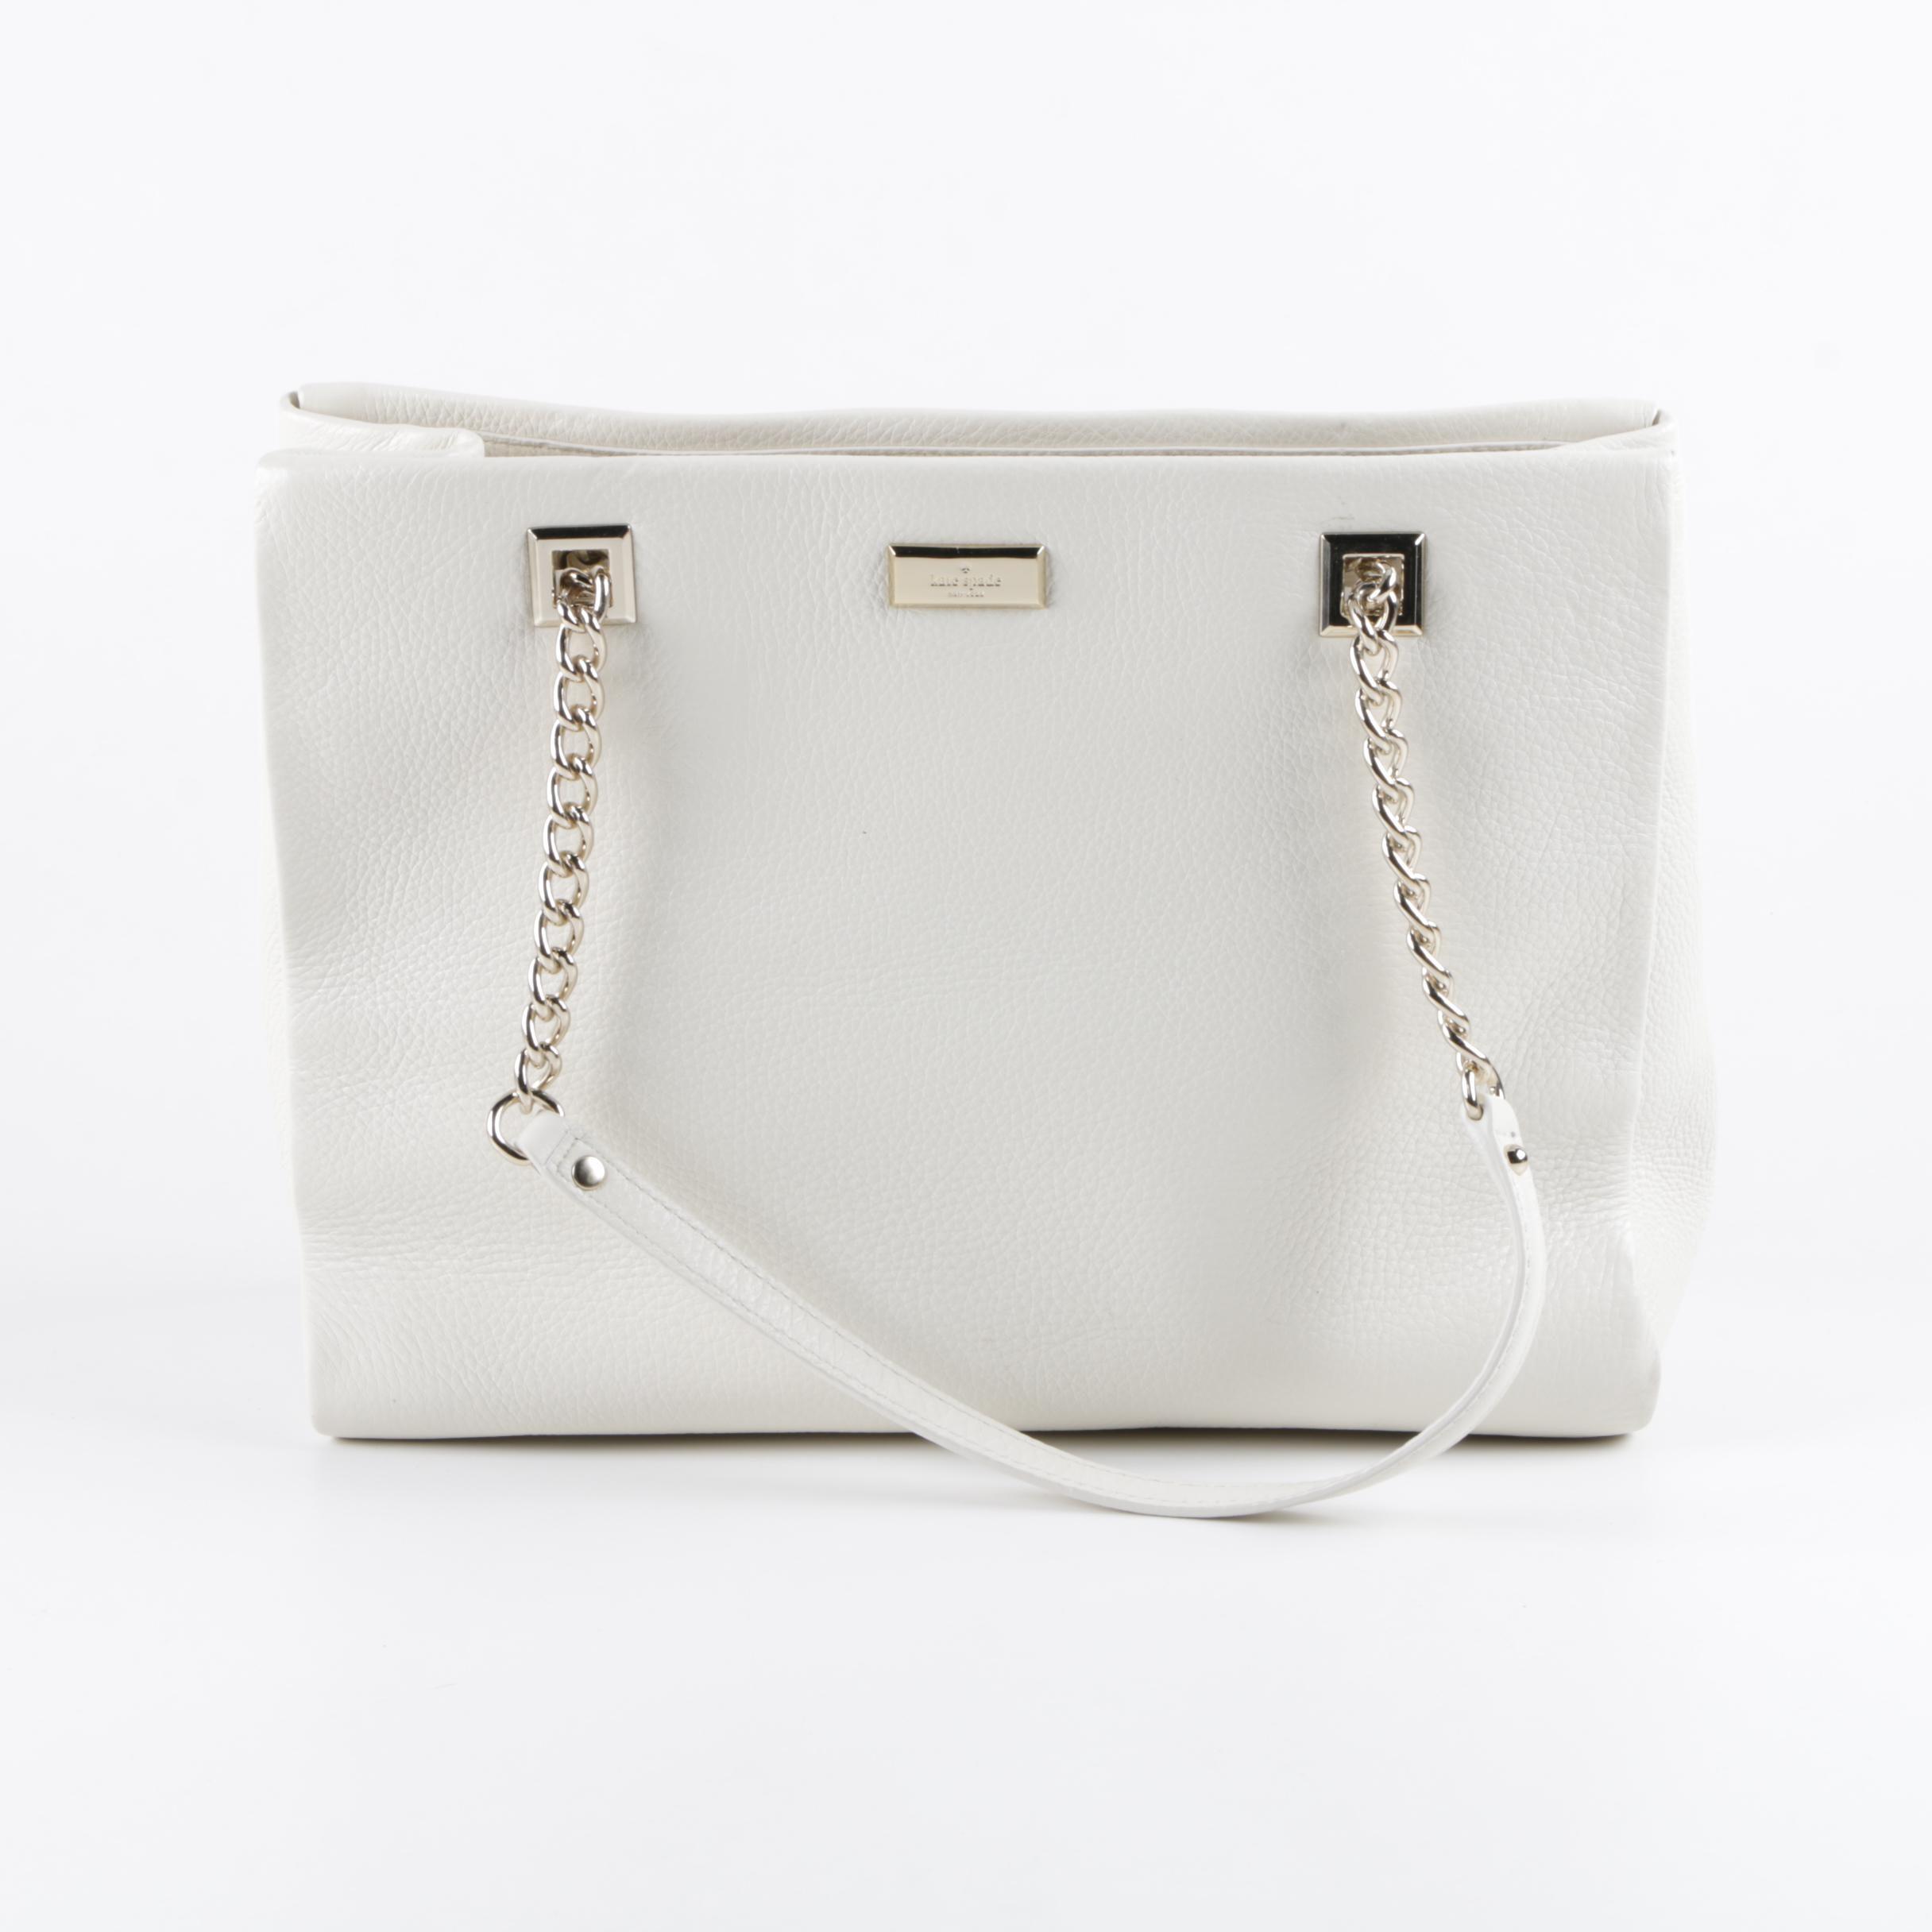 Kate Spade New York White Leather Handbag